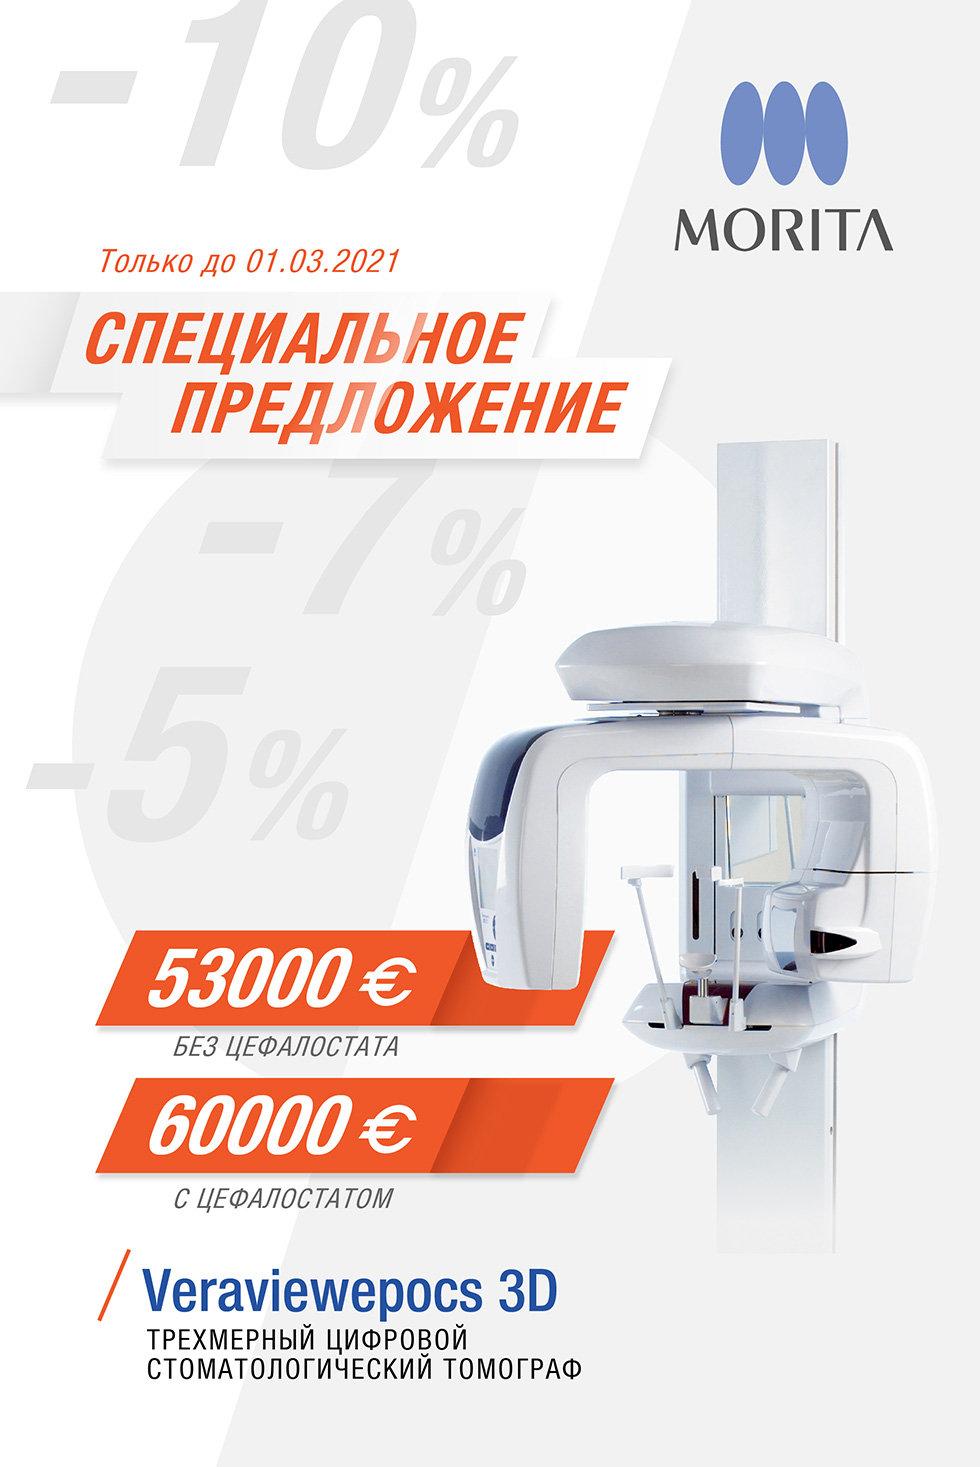 Rassylka-02022021-980.jpg